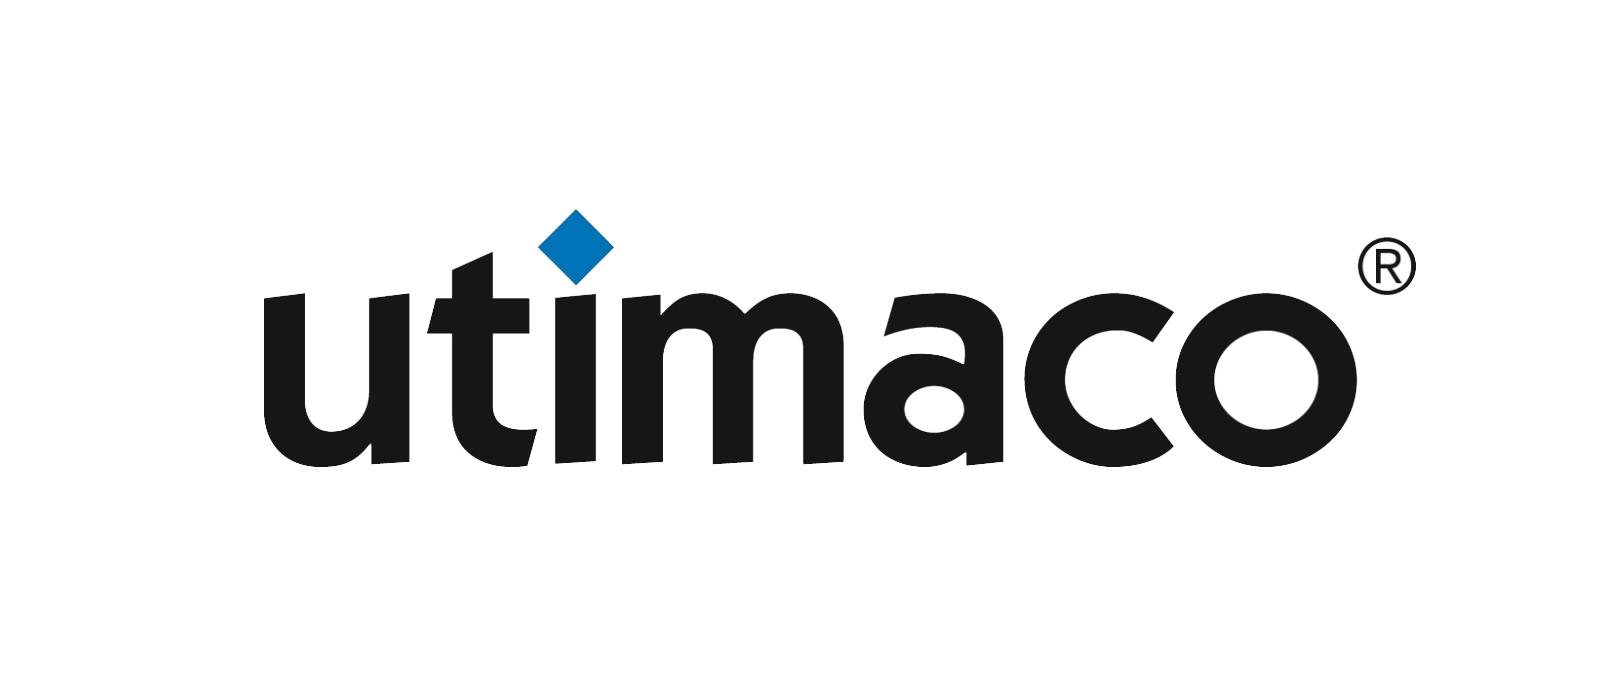 Utimaco Announces u.trust Anchor, Its Next Generation High Performance HSM Platform